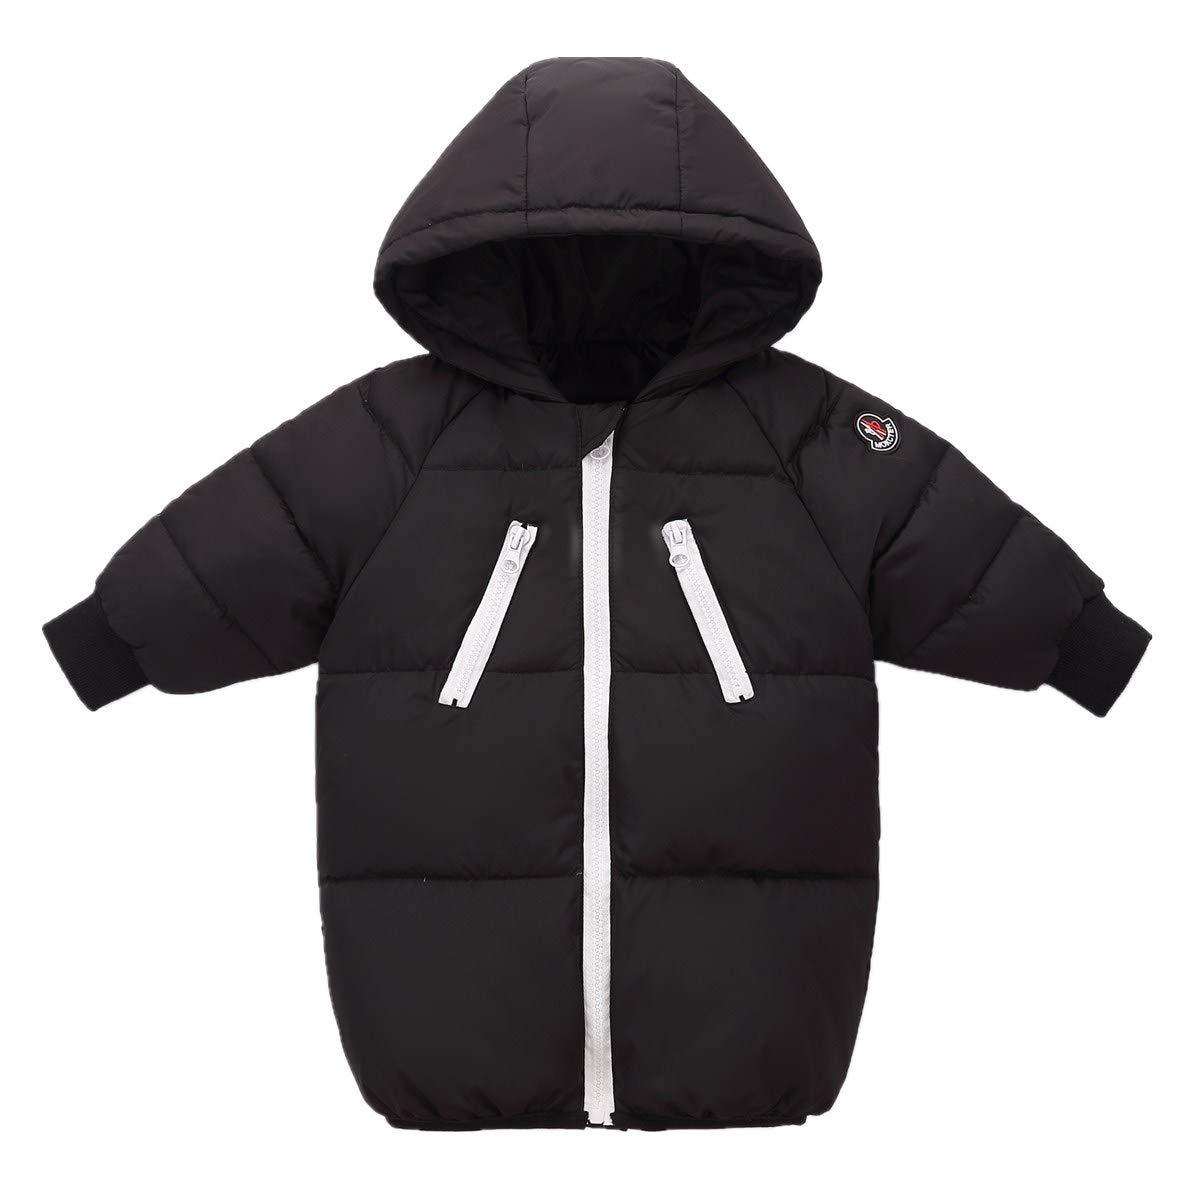 LJYH Little Boys and Girls Zipper Hood Winter Coat Down Parka Childrens Warm Down Puffer Jacket